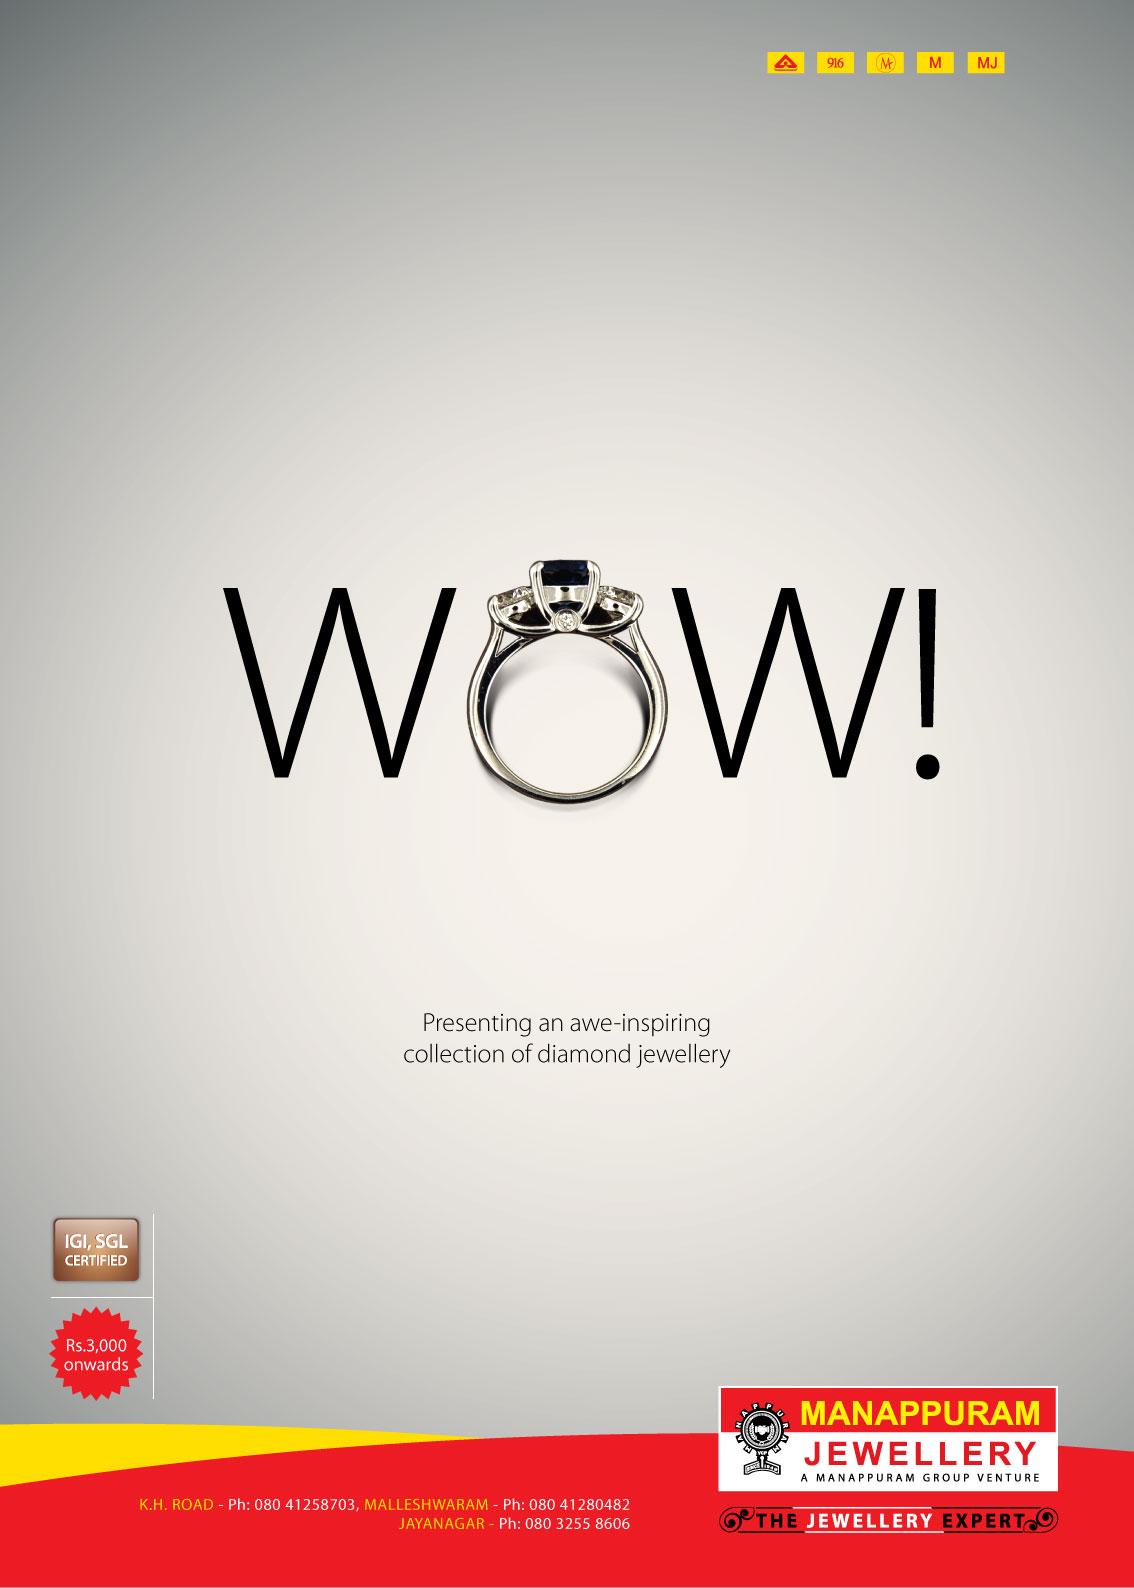 Save changes!: Manappuram Jewellery